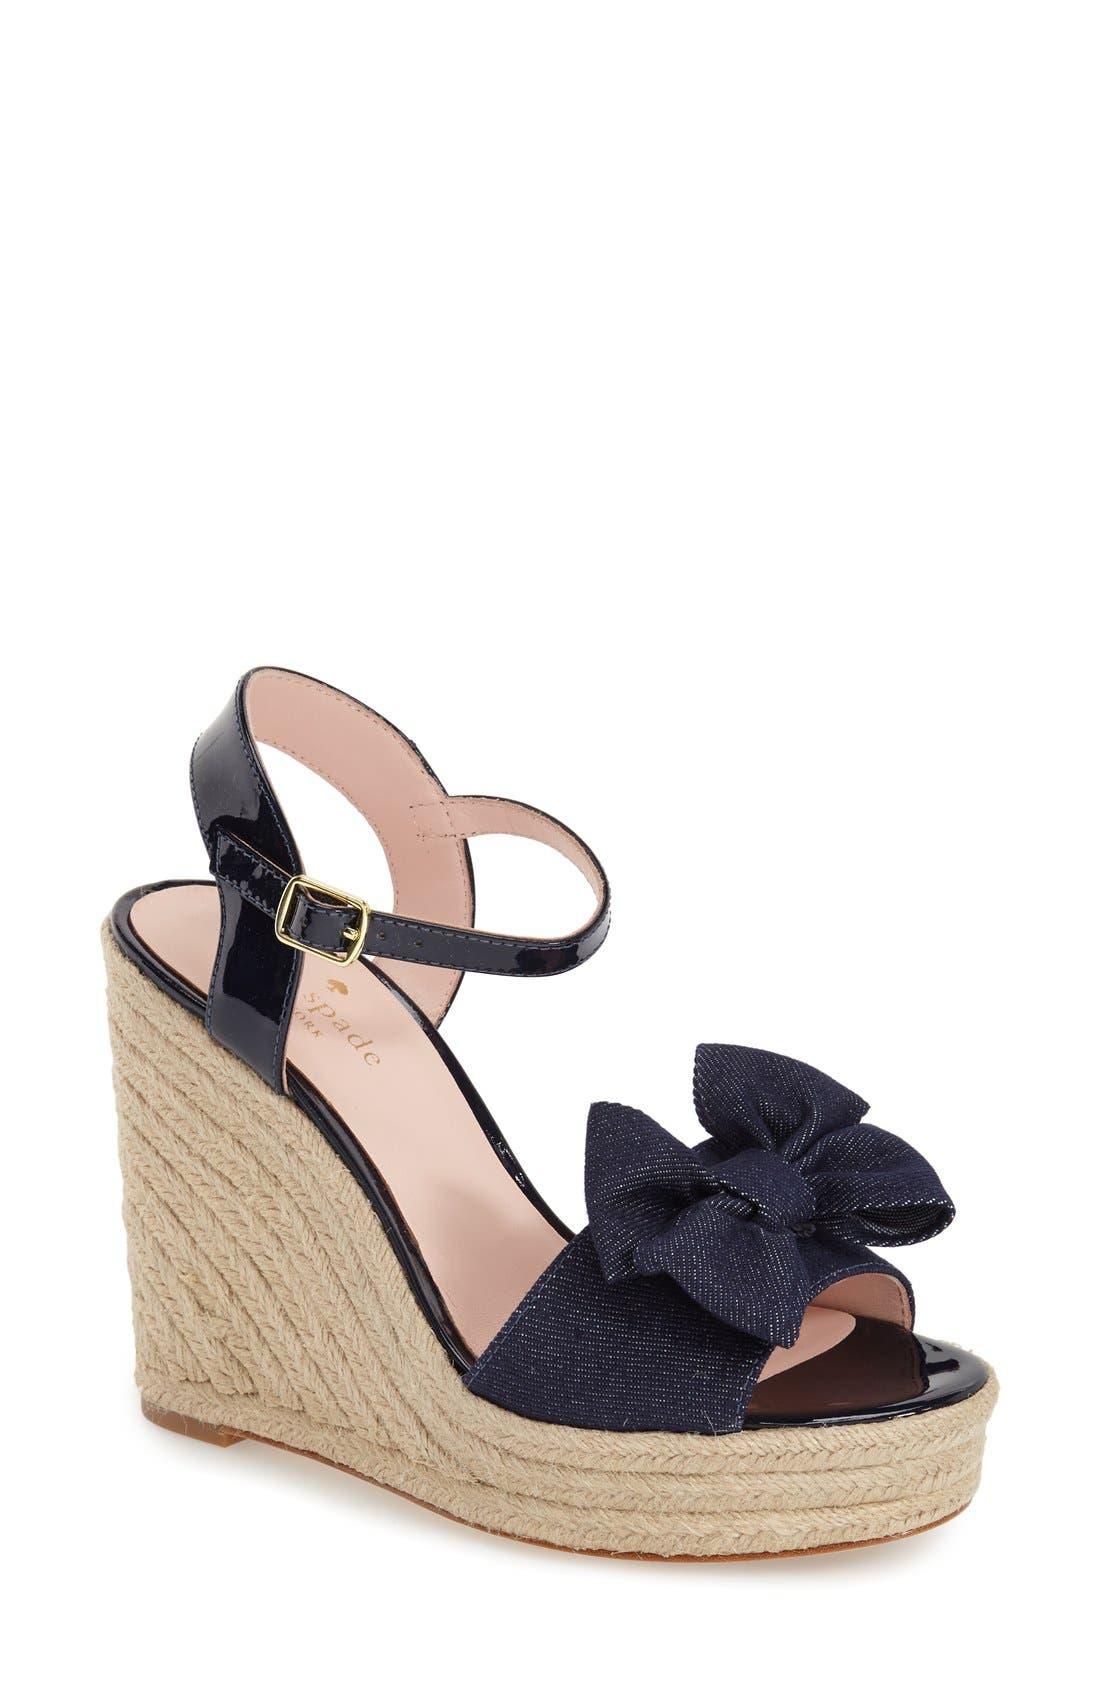 Main Image - kate spade new york 'darya' wedge sandal (Women)